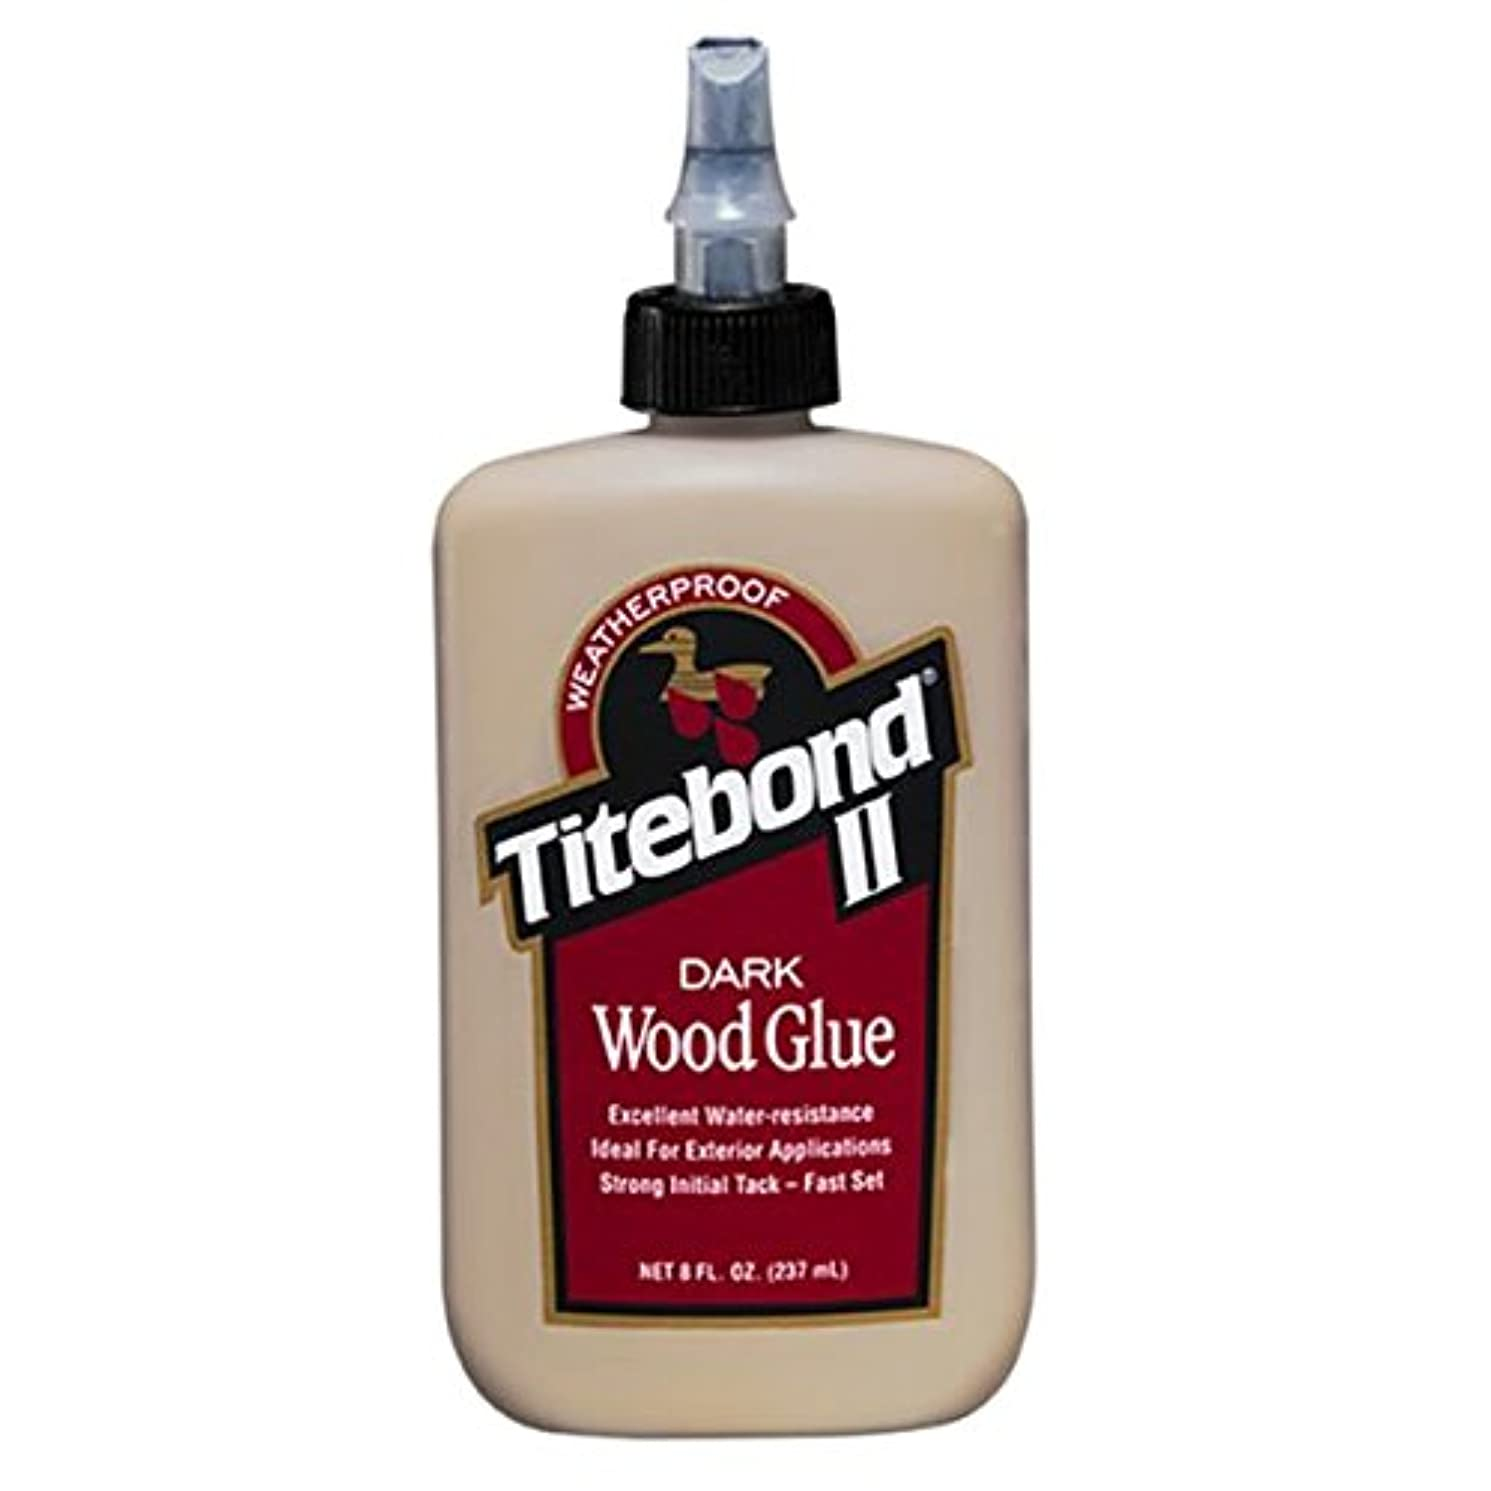 Titebond 3703 Cross-Linking Polyvinyl Acetate Dark Wood Glue, 8 Oz, Bottle, Light, Liquid, Brown